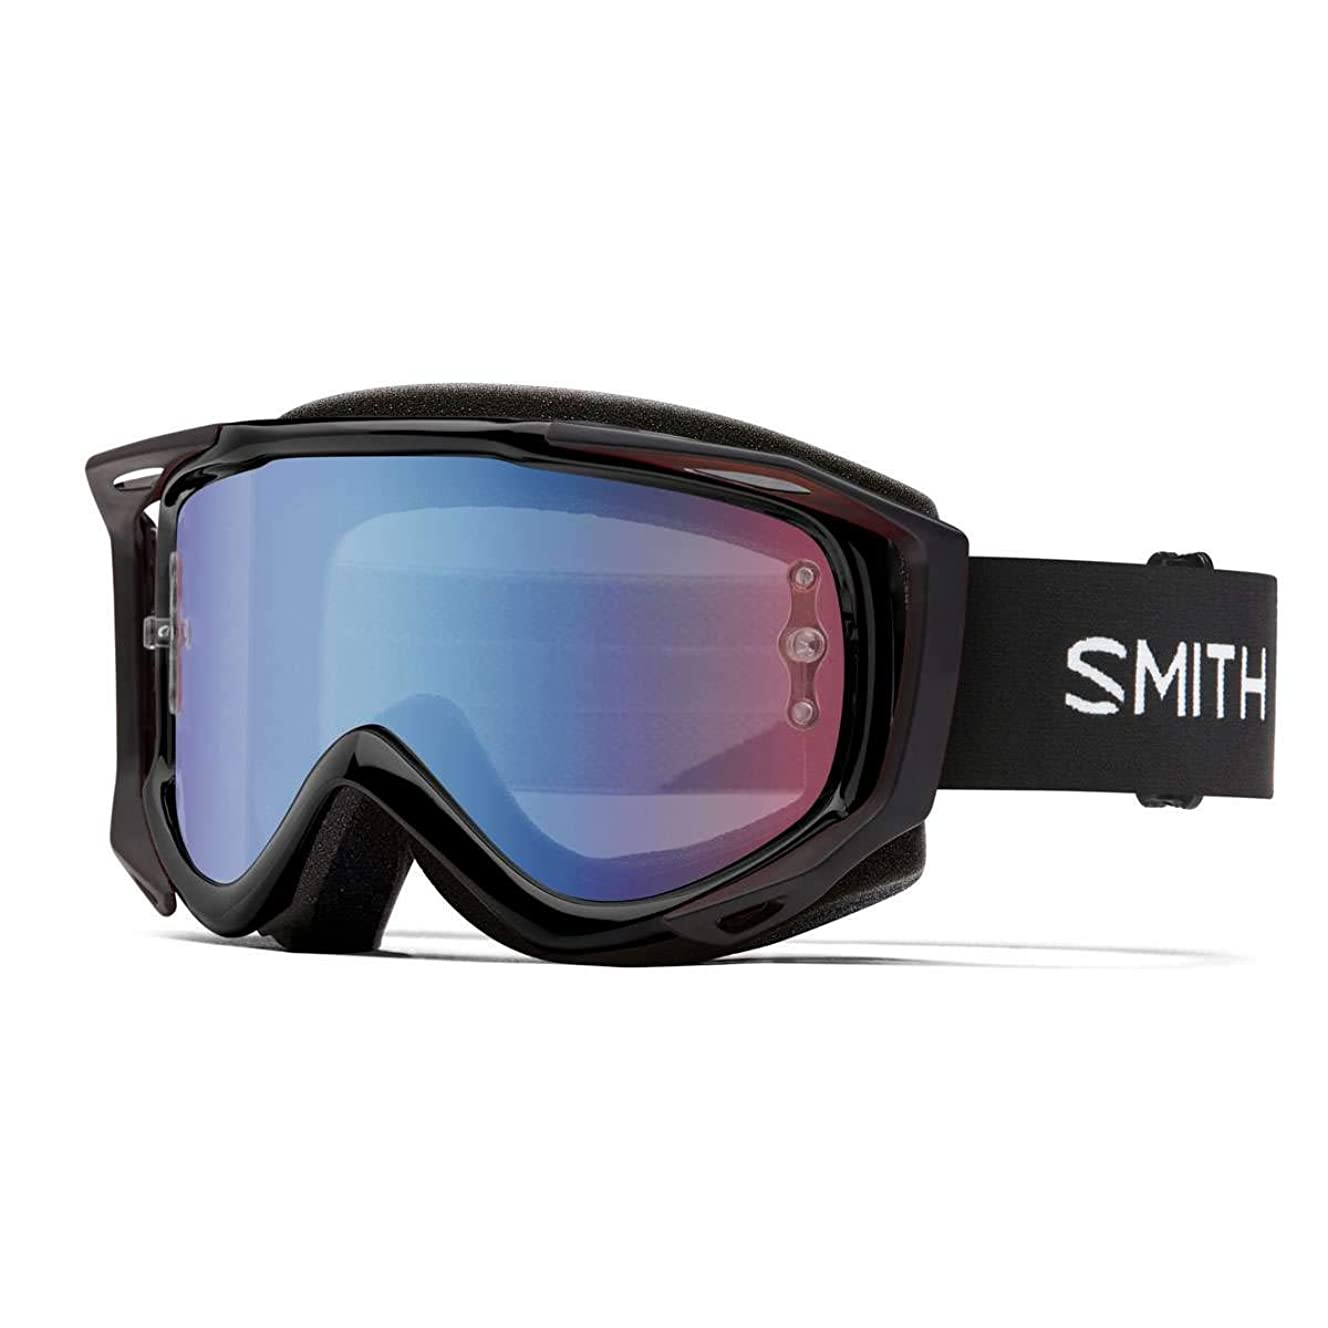 Smith Optics Fuel V.2 Adult Off-Road Cycling Goggles - Black/Blue Sensor/One Size